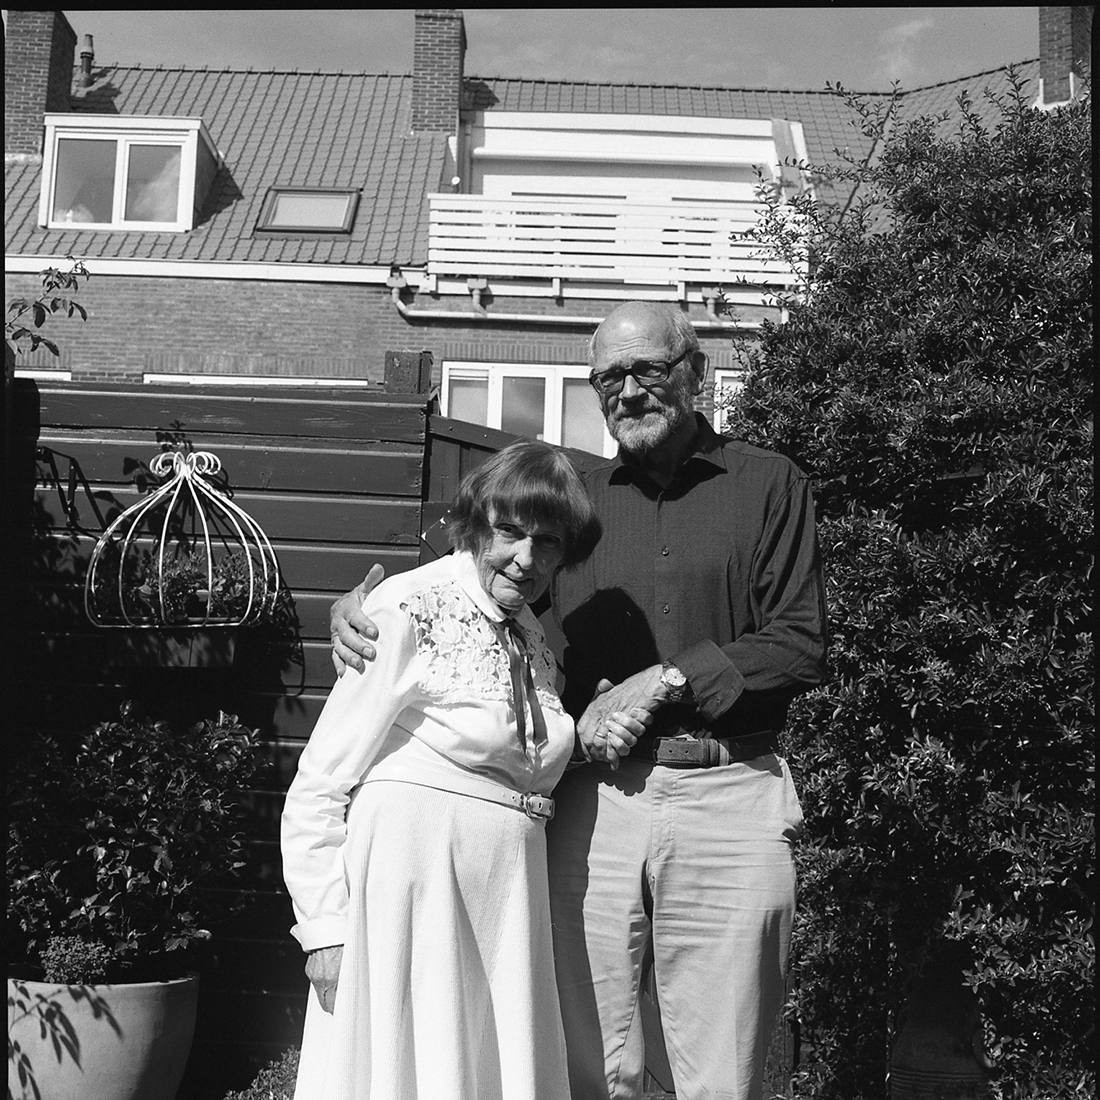 Grandma and grandpa posing in the backyard